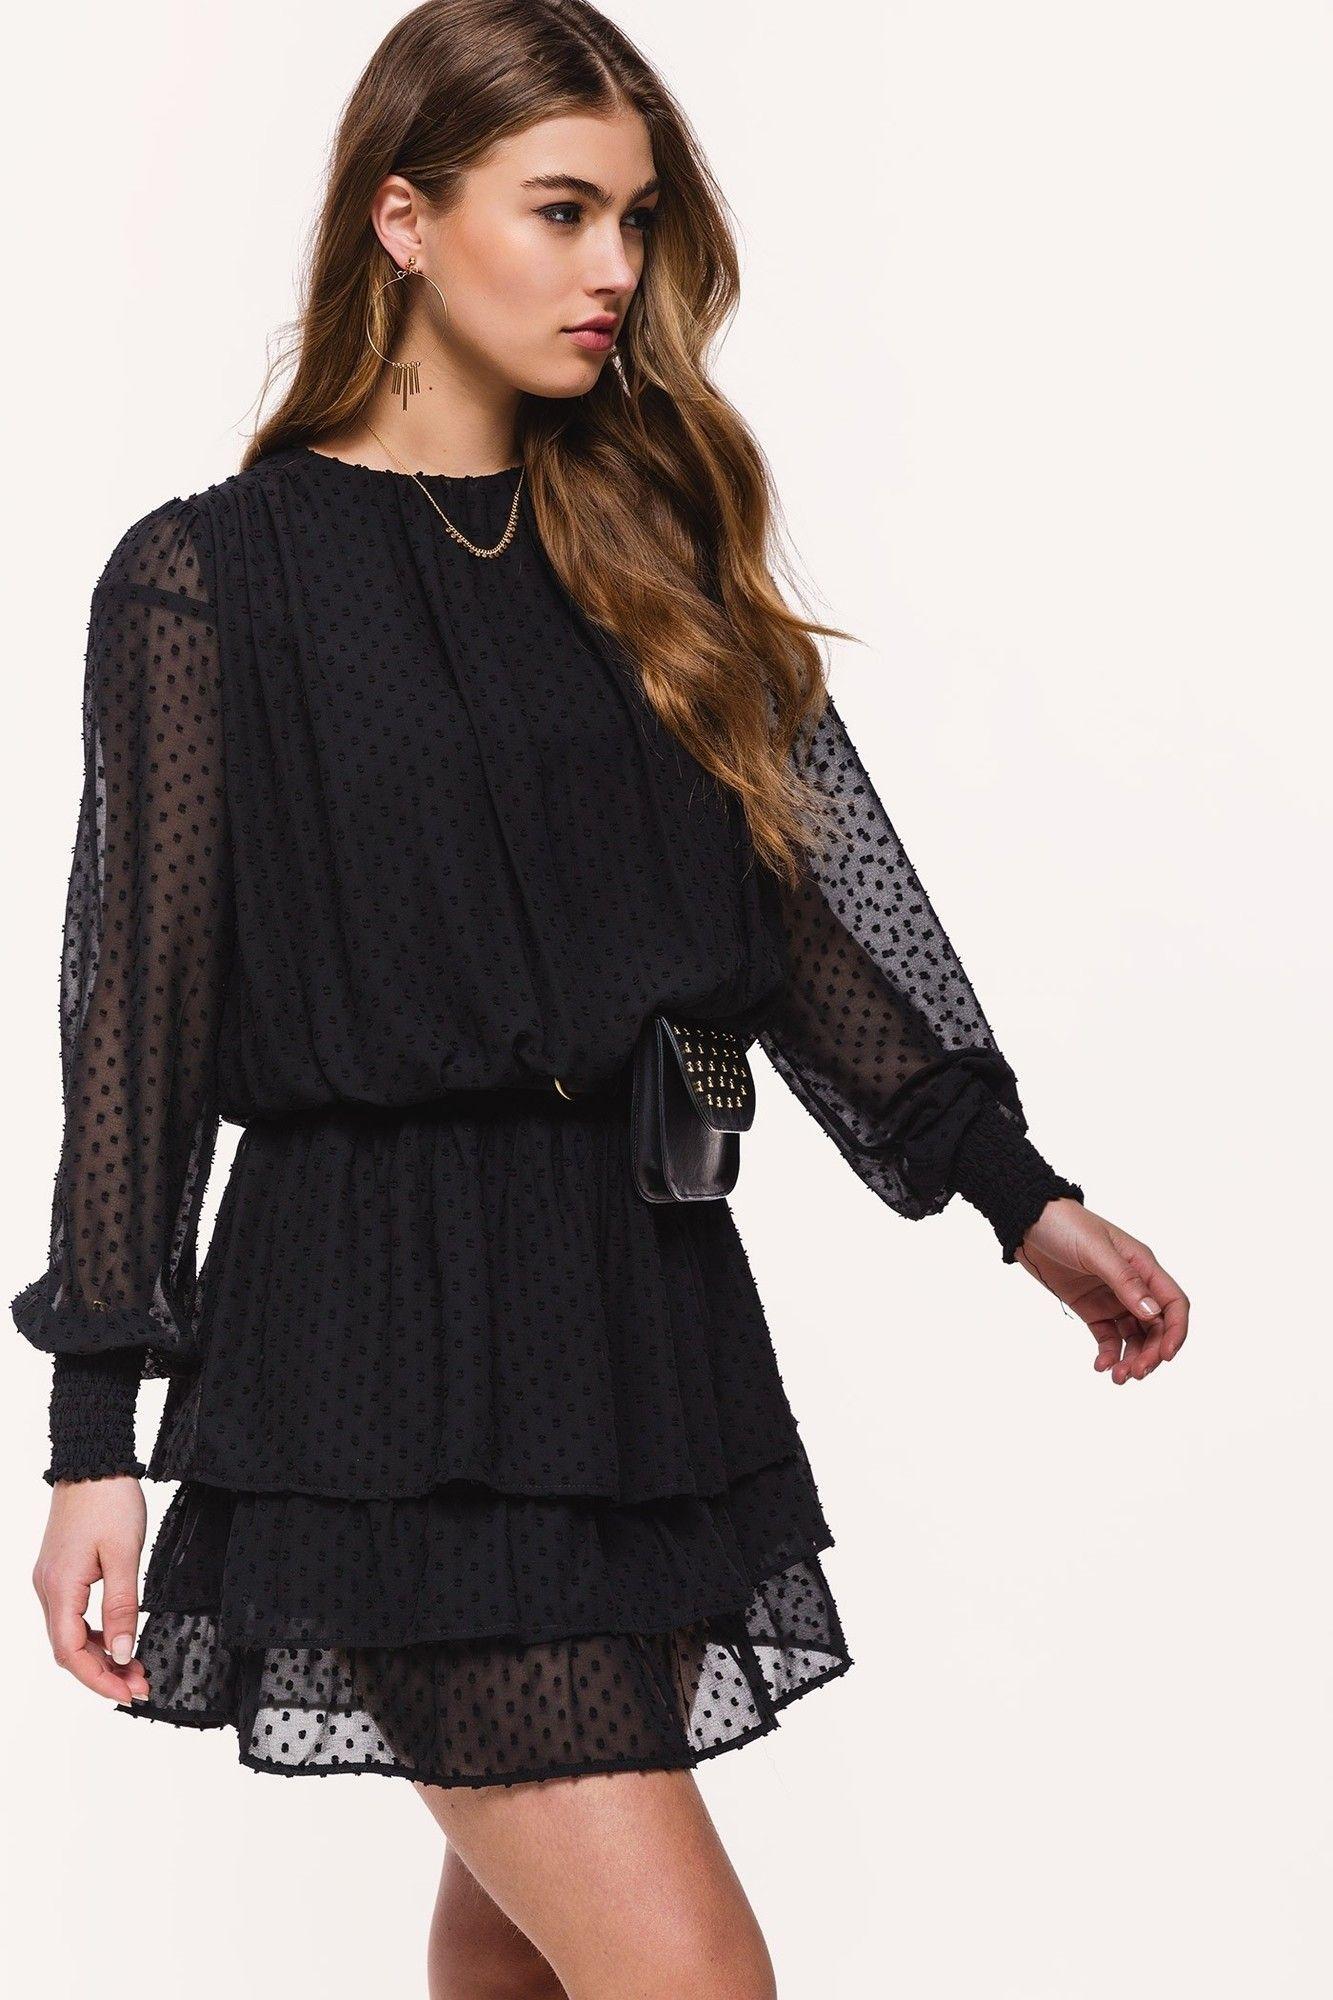 d5bc7206 Loavies ruffle dress | Fashion Webshop LOAVIES | Spring 2018 ...